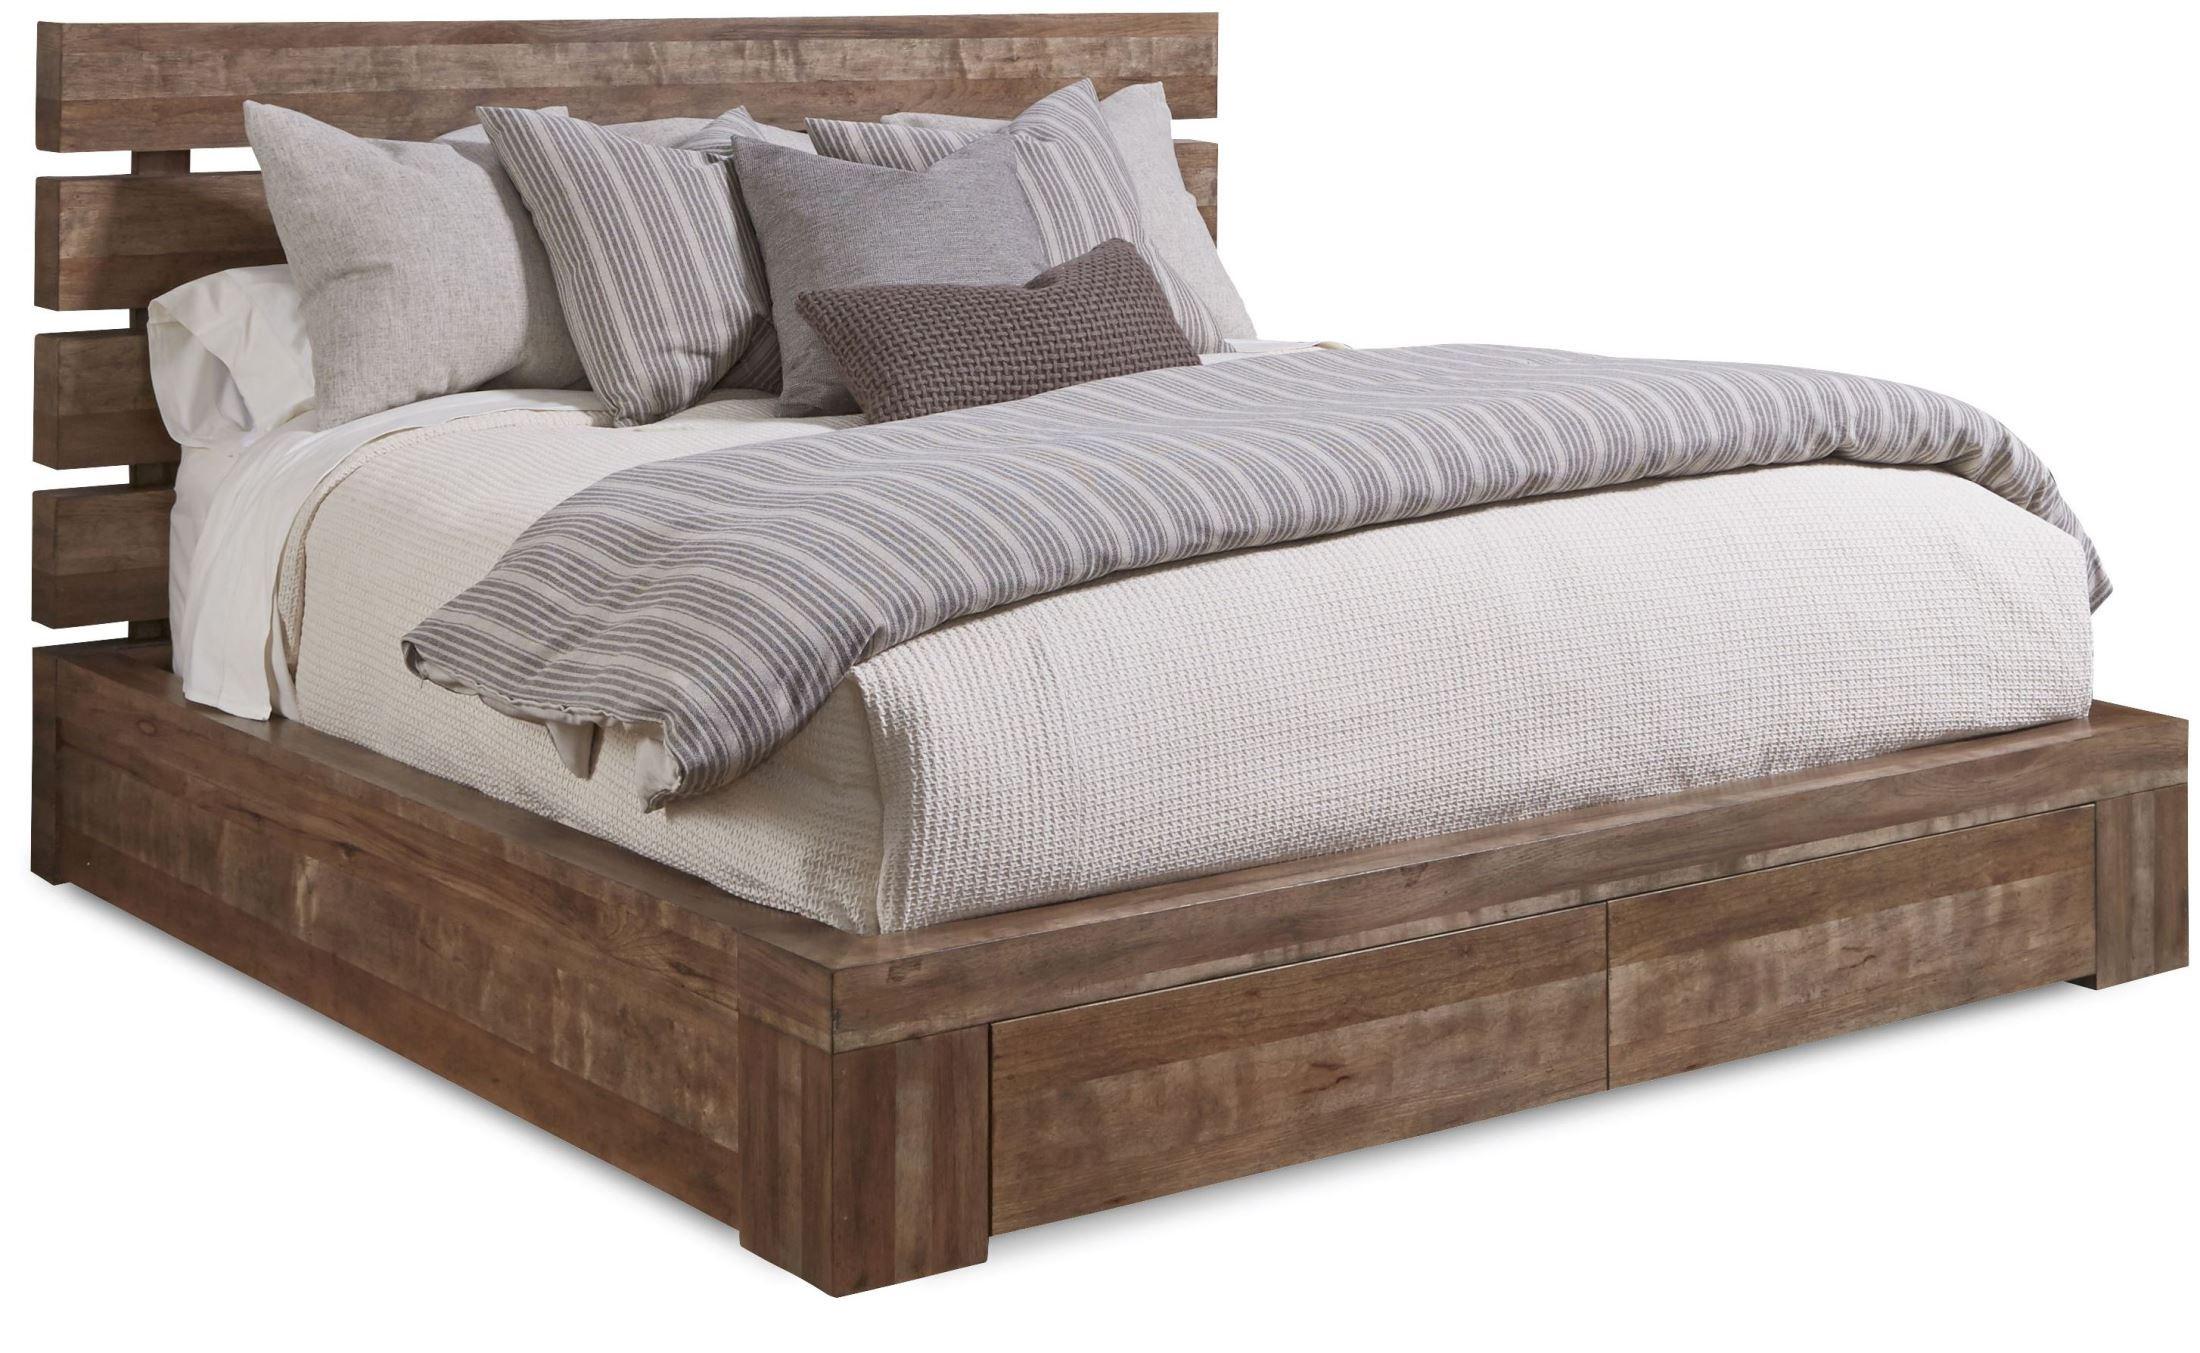 epicenters williamsburg queen platform storage bed from art 223125 2302 coleman furniture. Black Bedroom Furniture Sets. Home Design Ideas